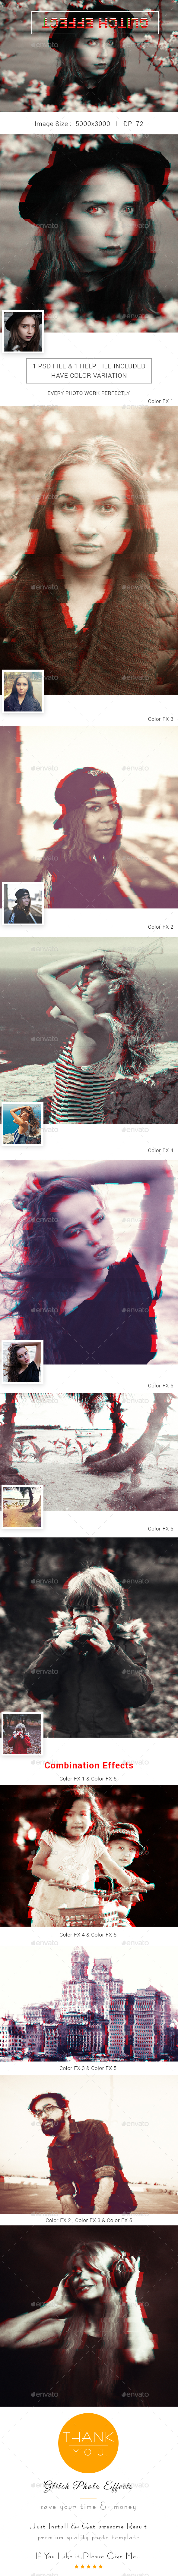 Glitch Photo Effects - Photo Templates Graphics